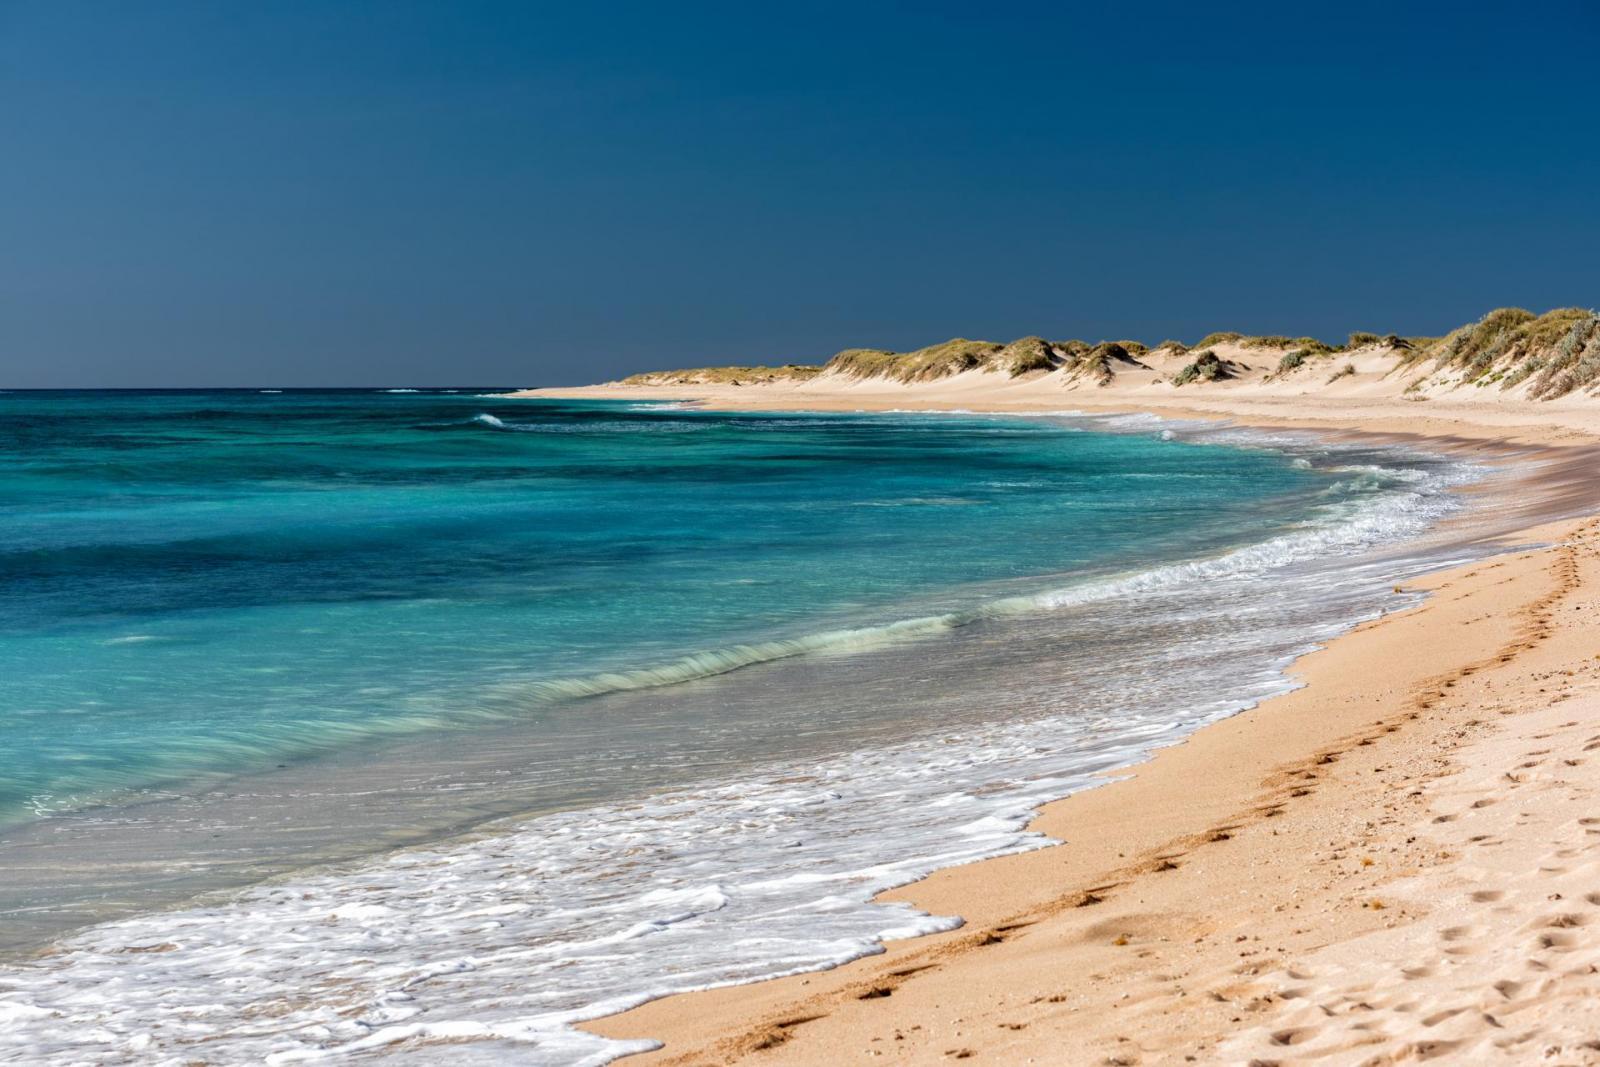 Ningaloo west australia paradise beach interessante Orte Australien